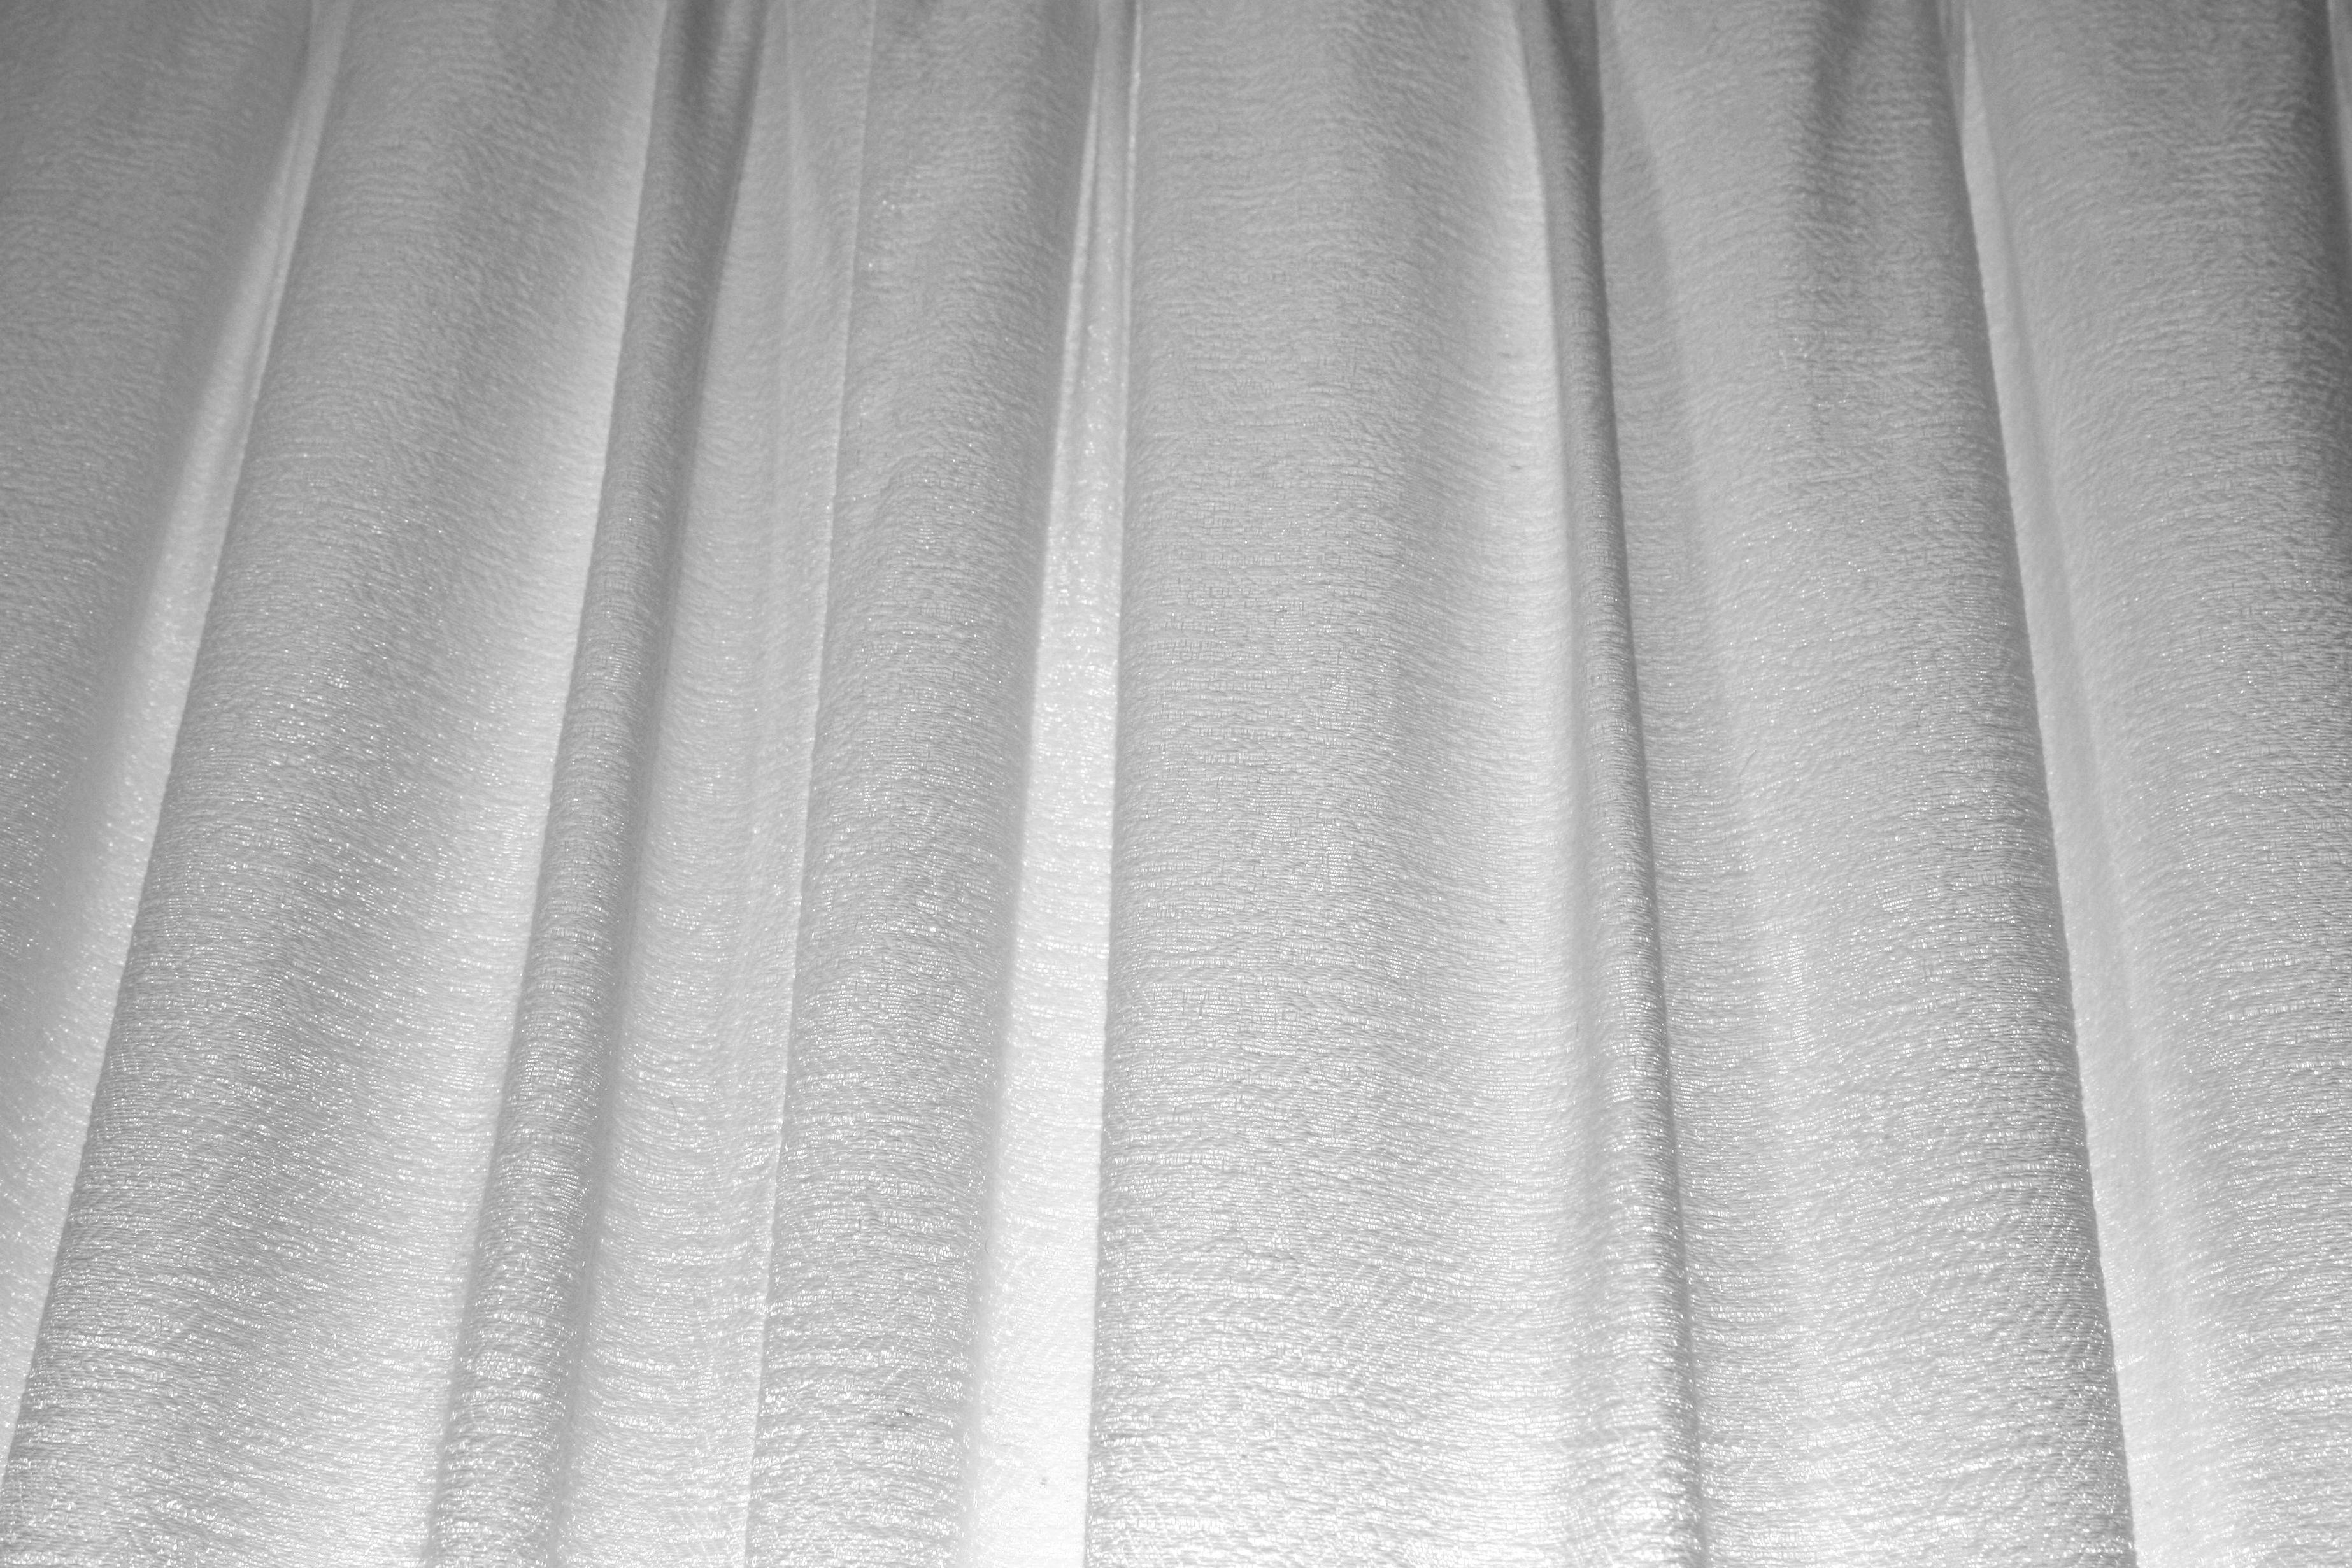 Imagen gratis cortinas blancas textil textura